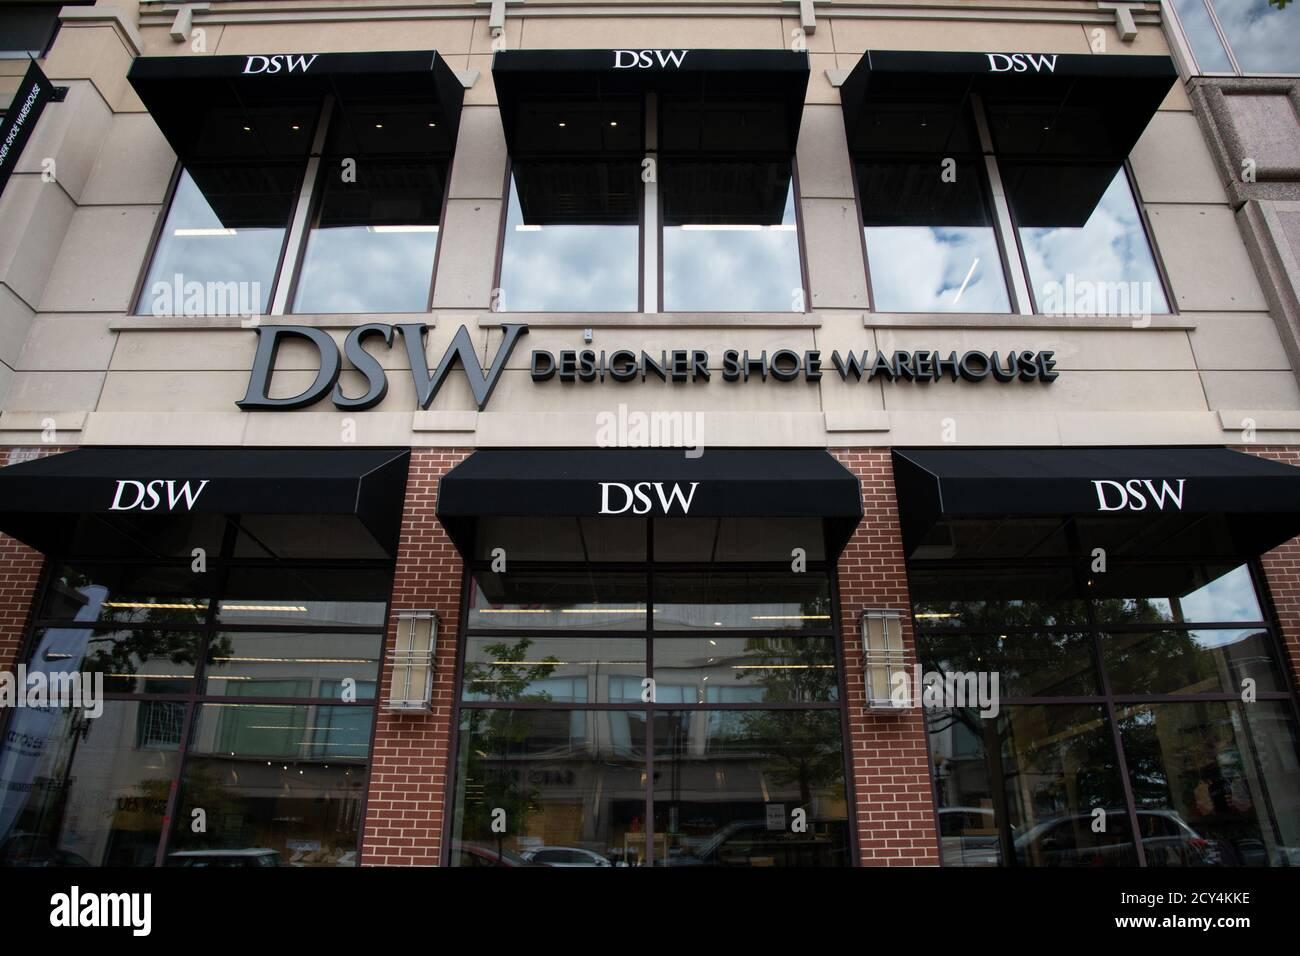 Dsw Designer Shoe Warehouse High